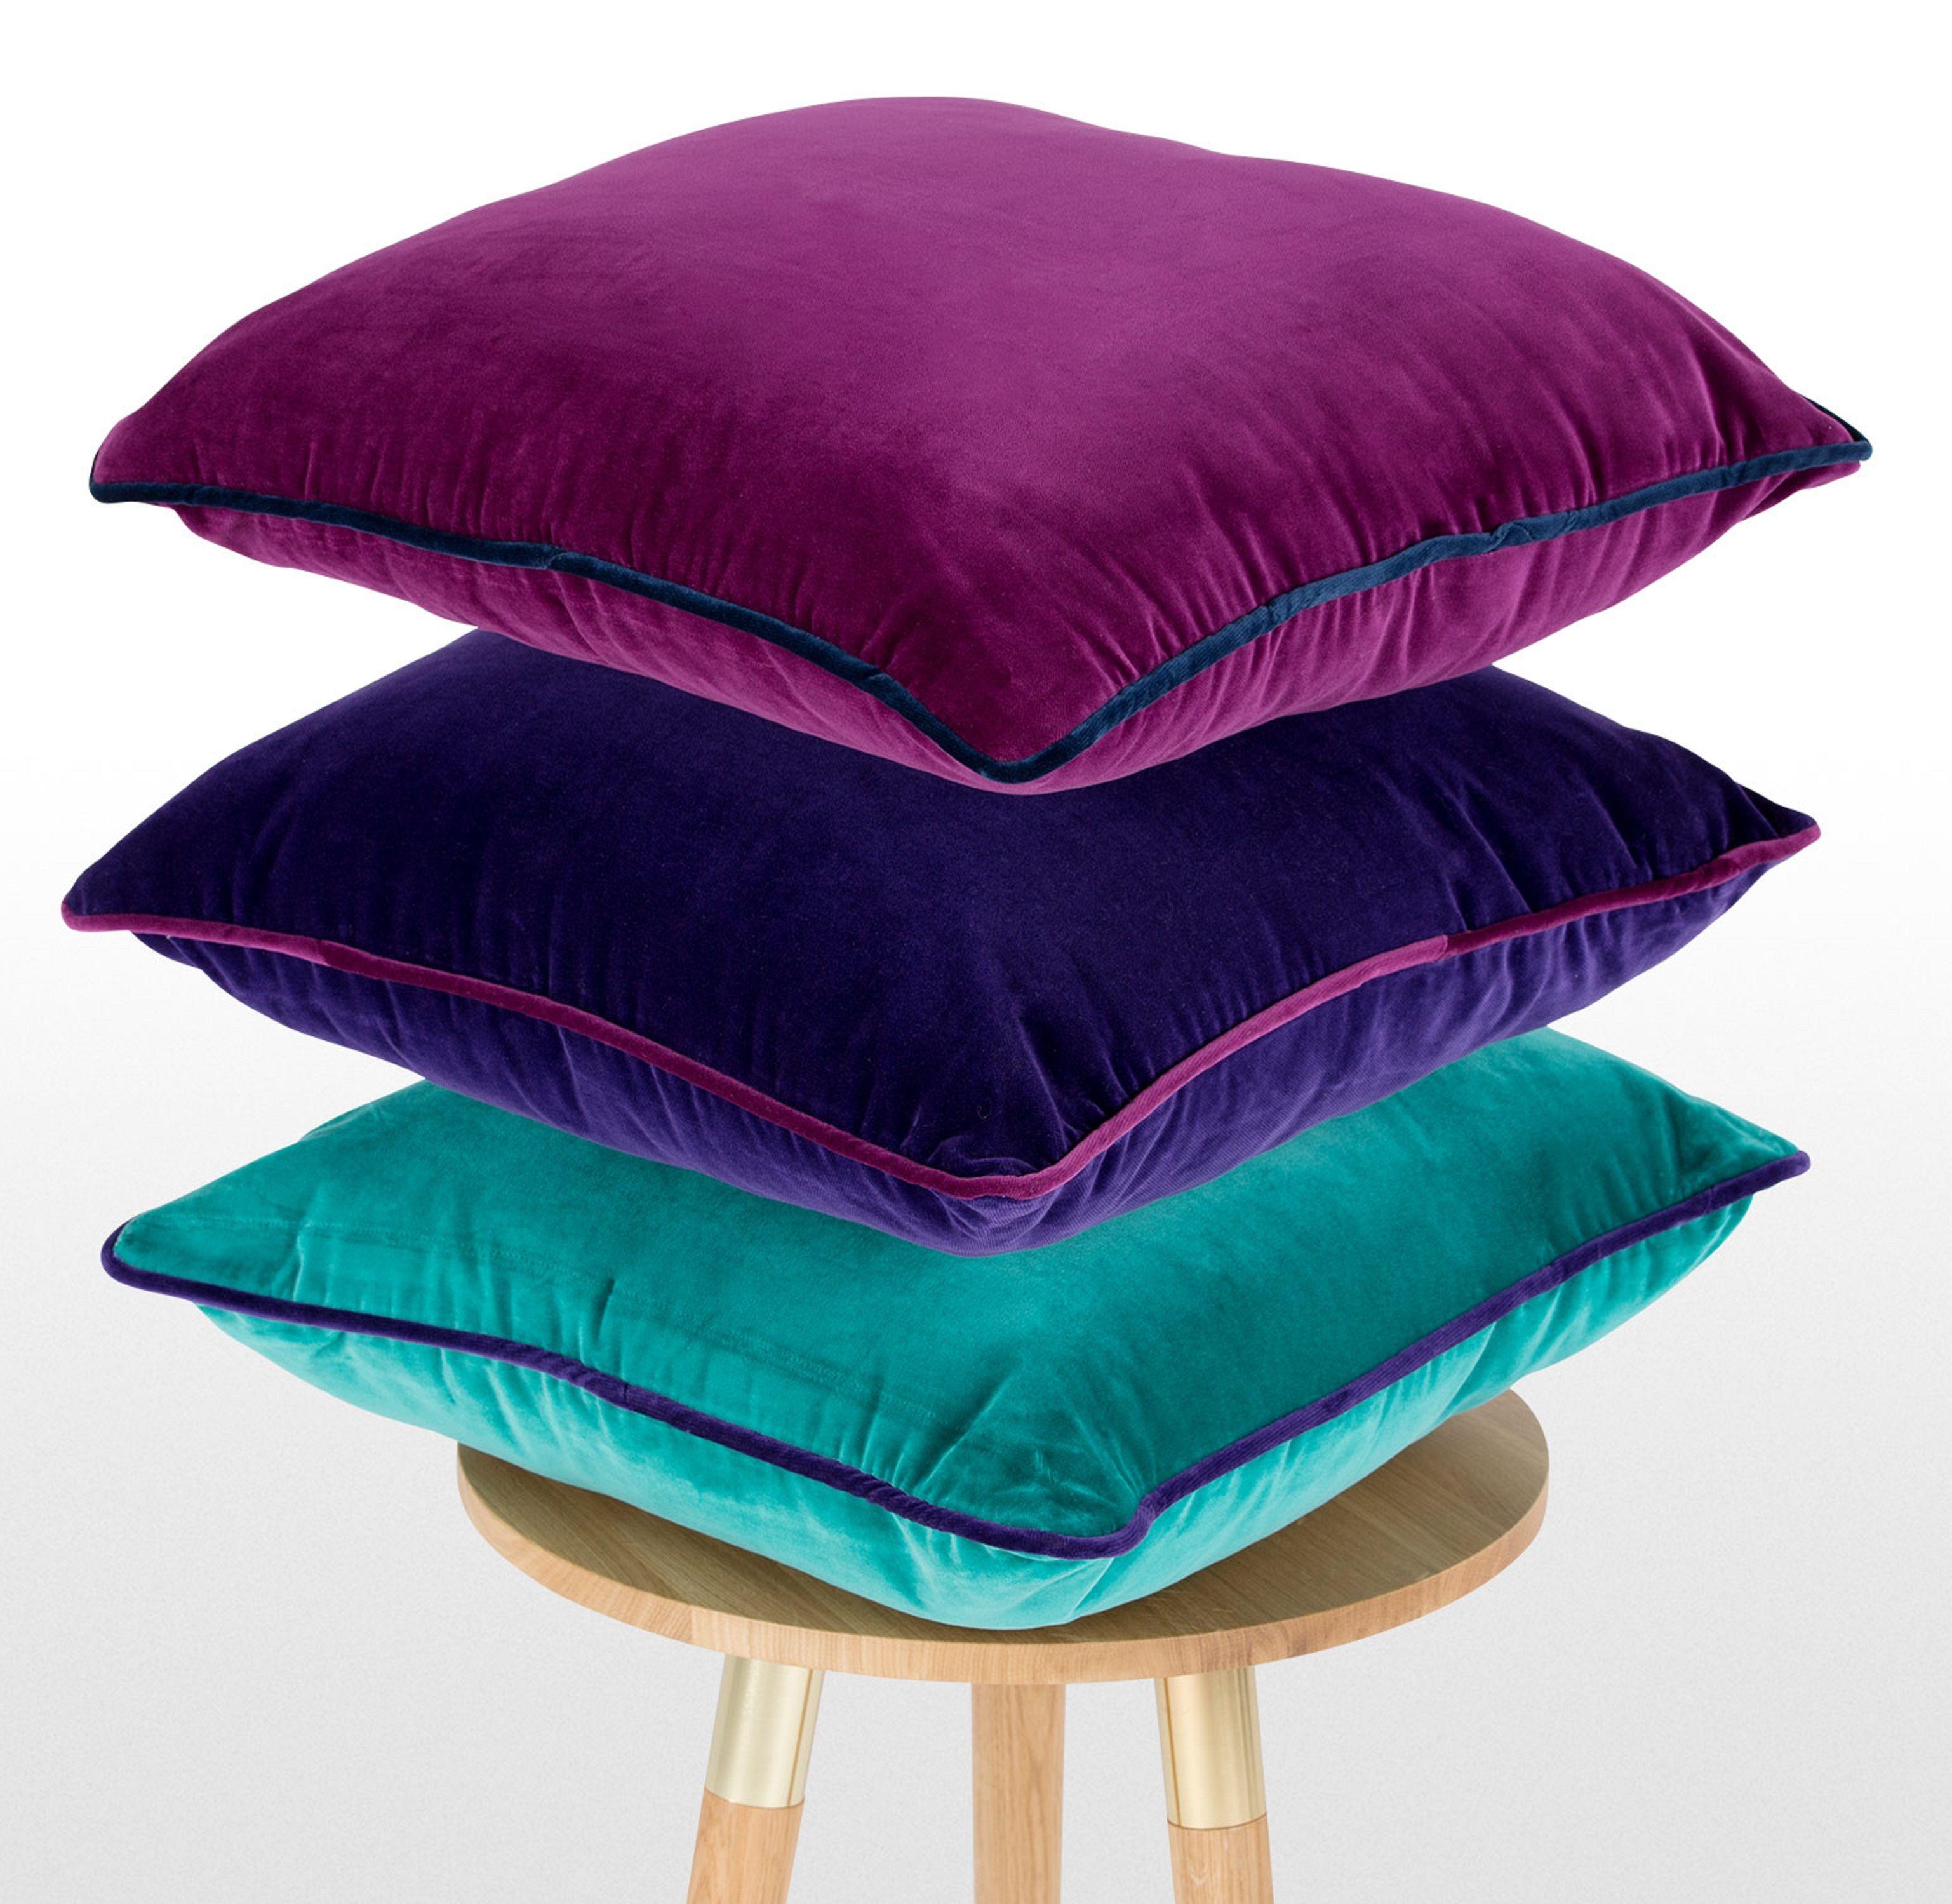 Plum Cushion In Velvet 50x50cm Vintage Style Mya Purple